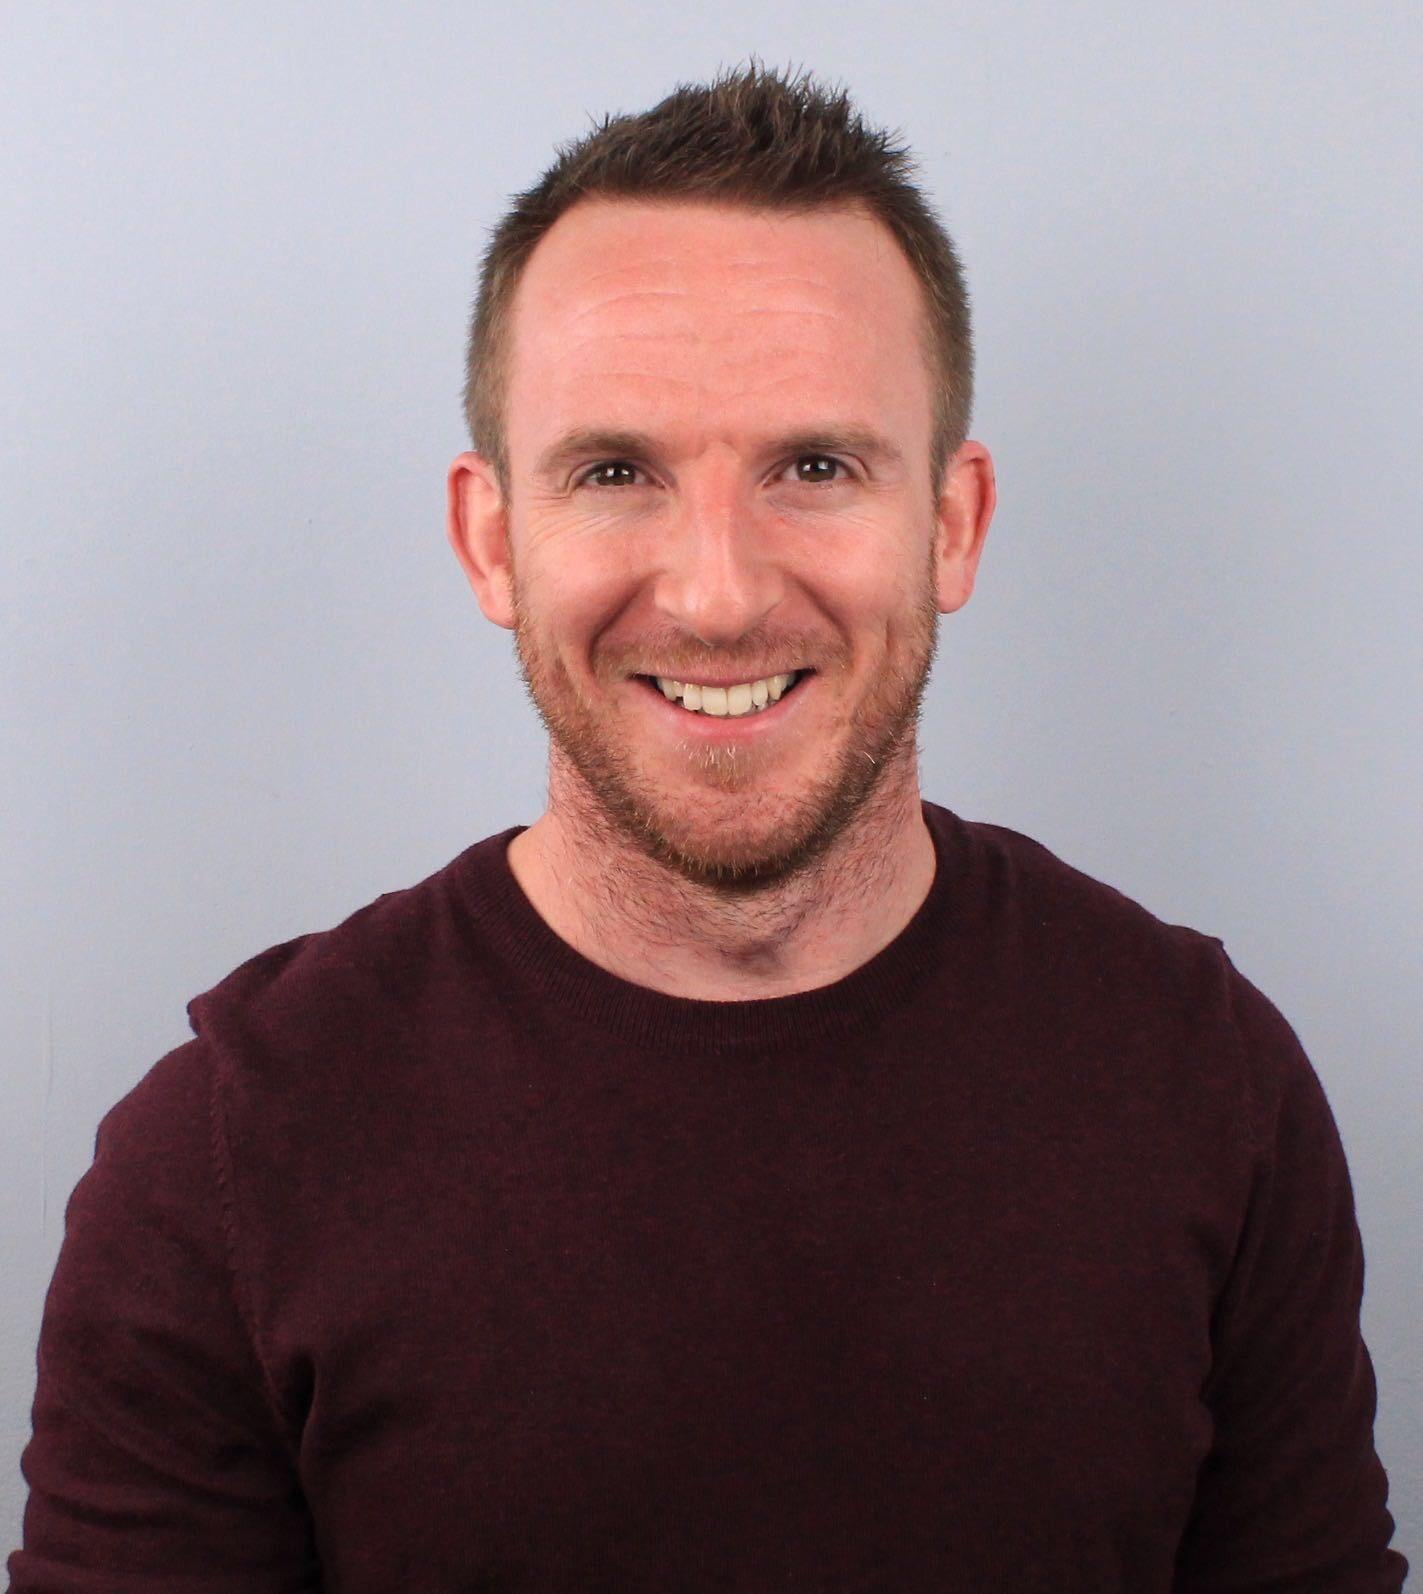 Steven O'Riordan